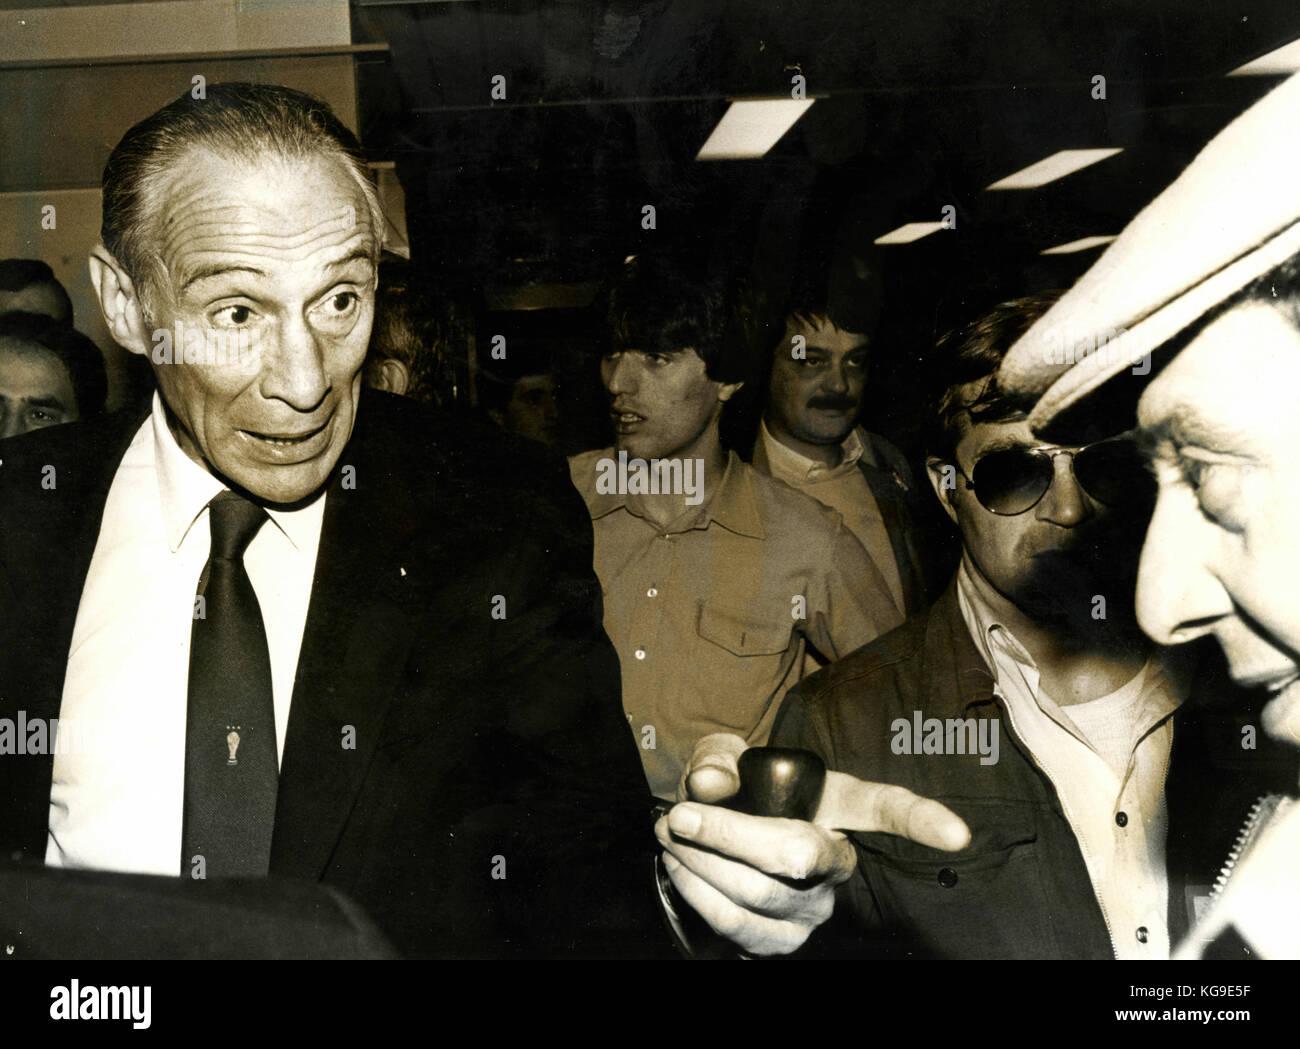 Enzo Bearzot, entrenador de la selección italiana de fútbol 1980 Imagen De Stock